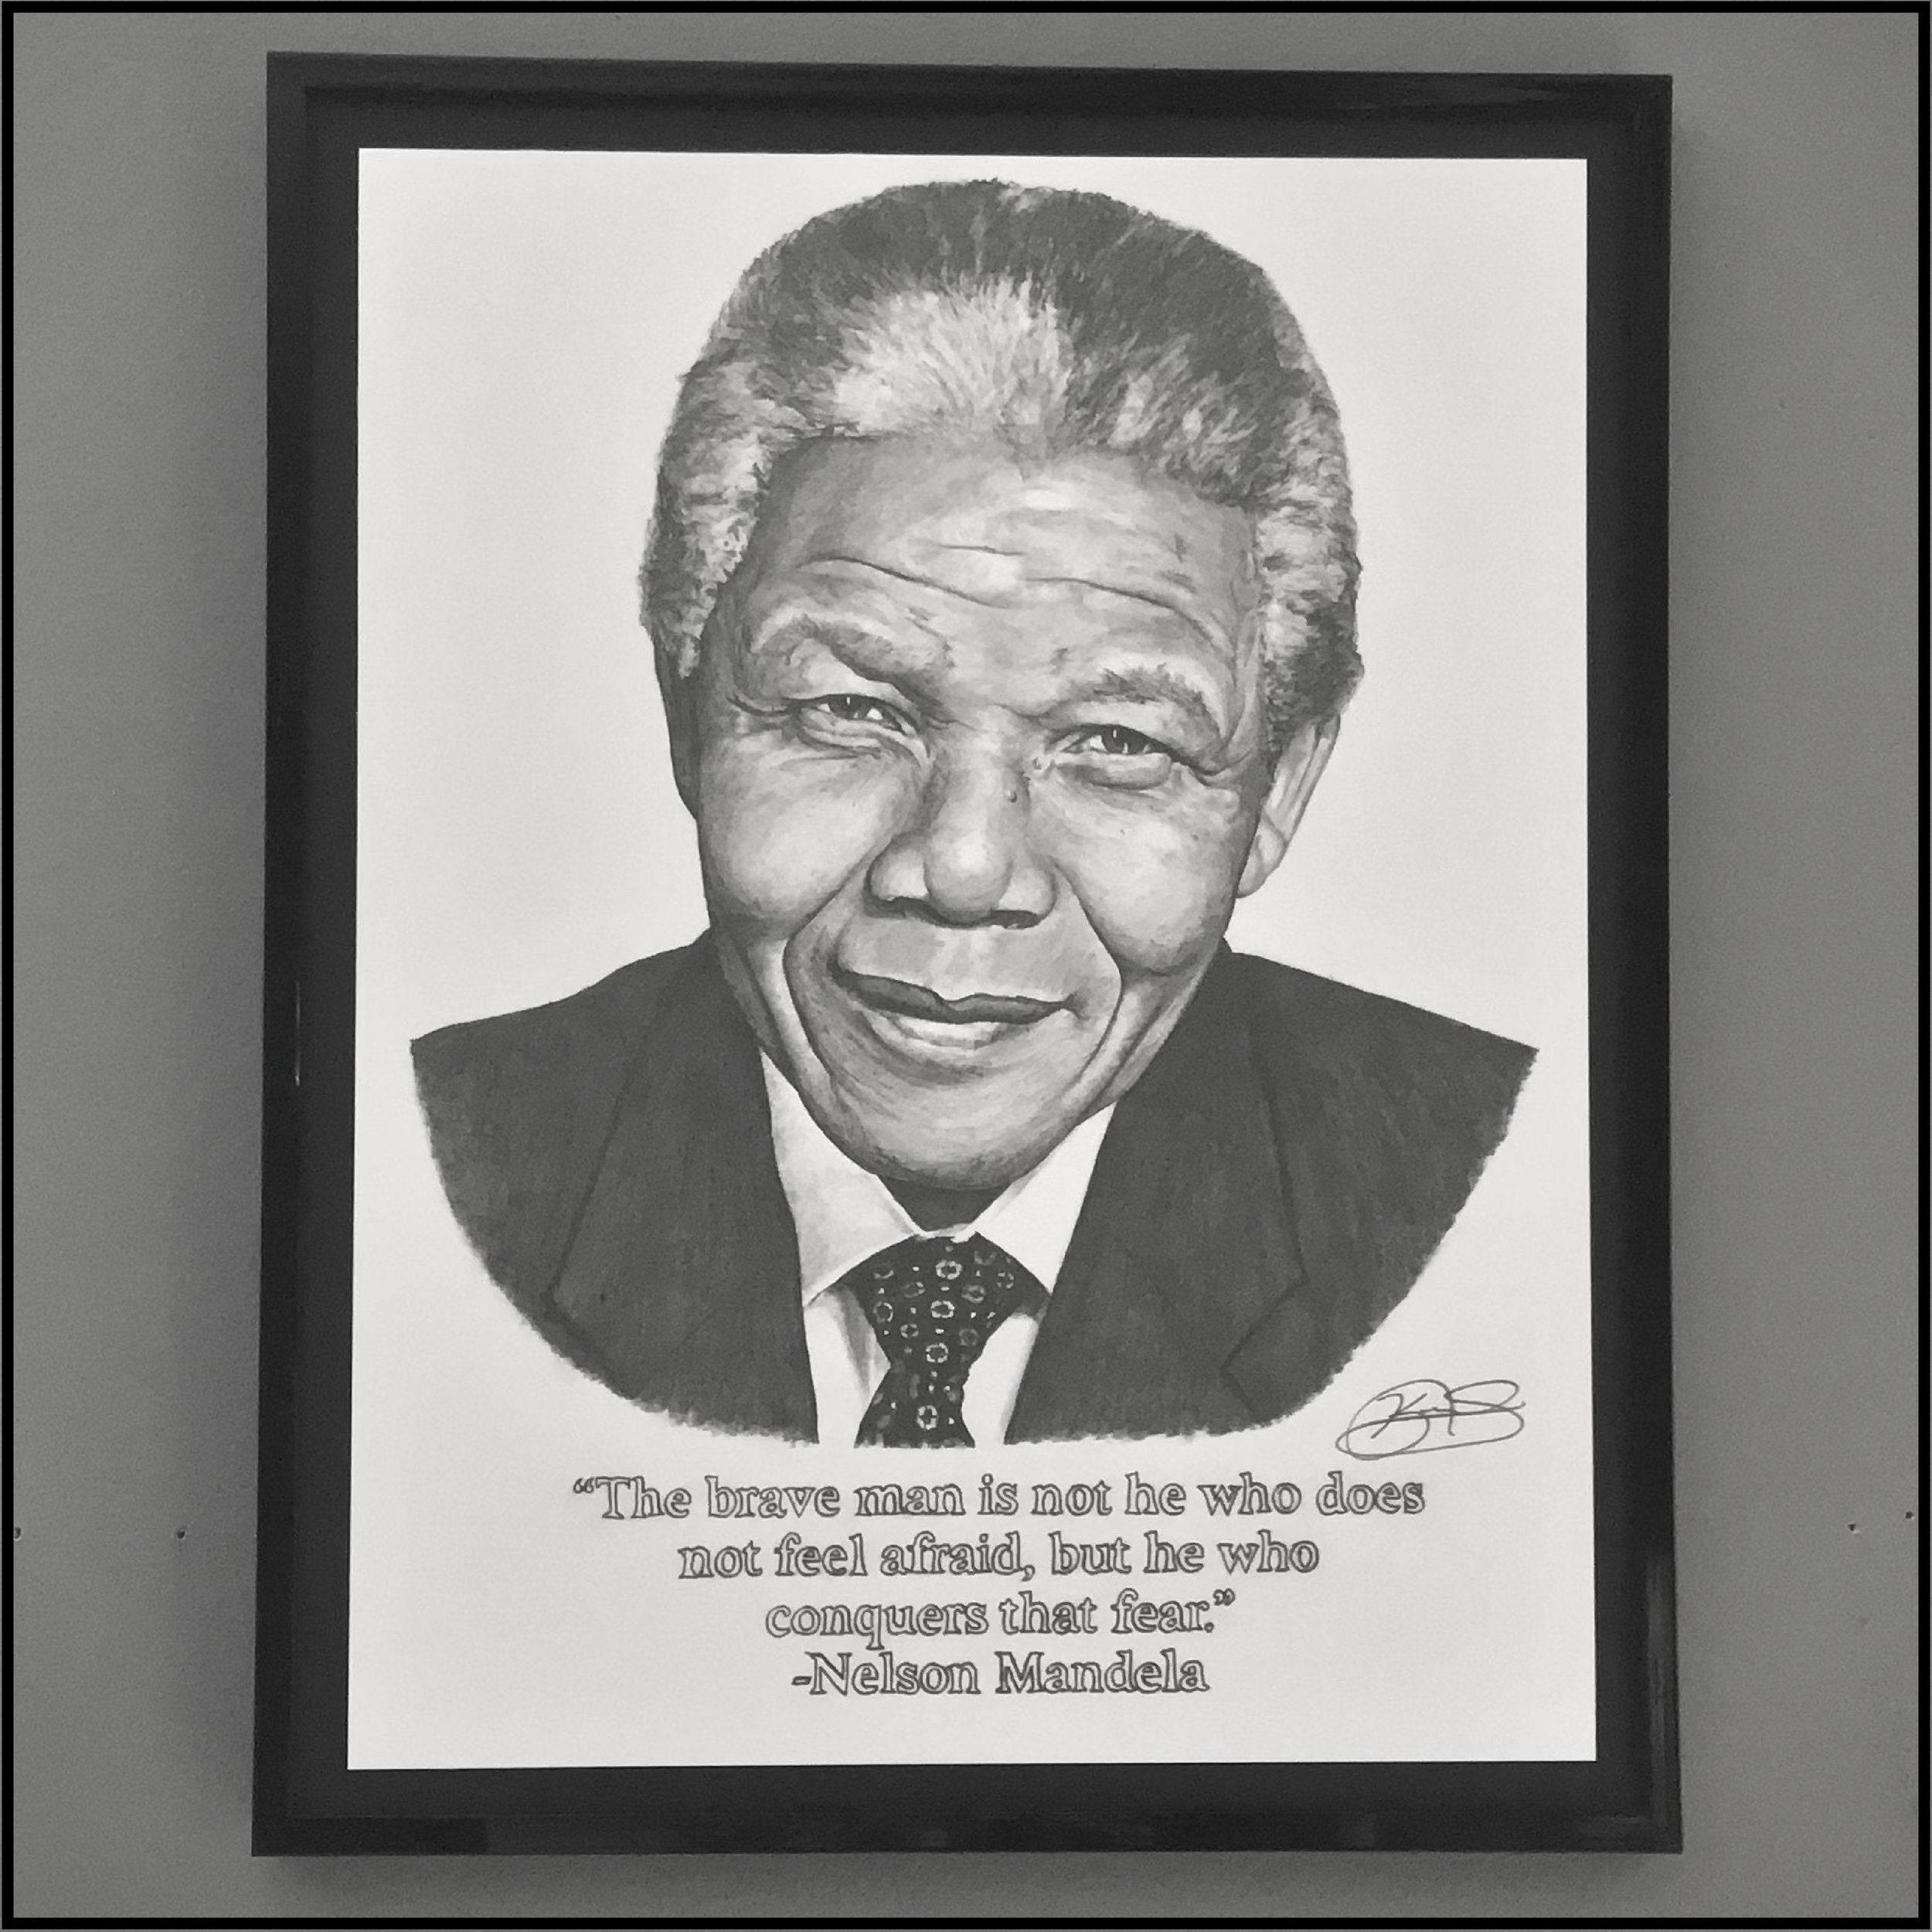 11x14 Framed Original Graphite Drawing Nelson Mandela Etsy